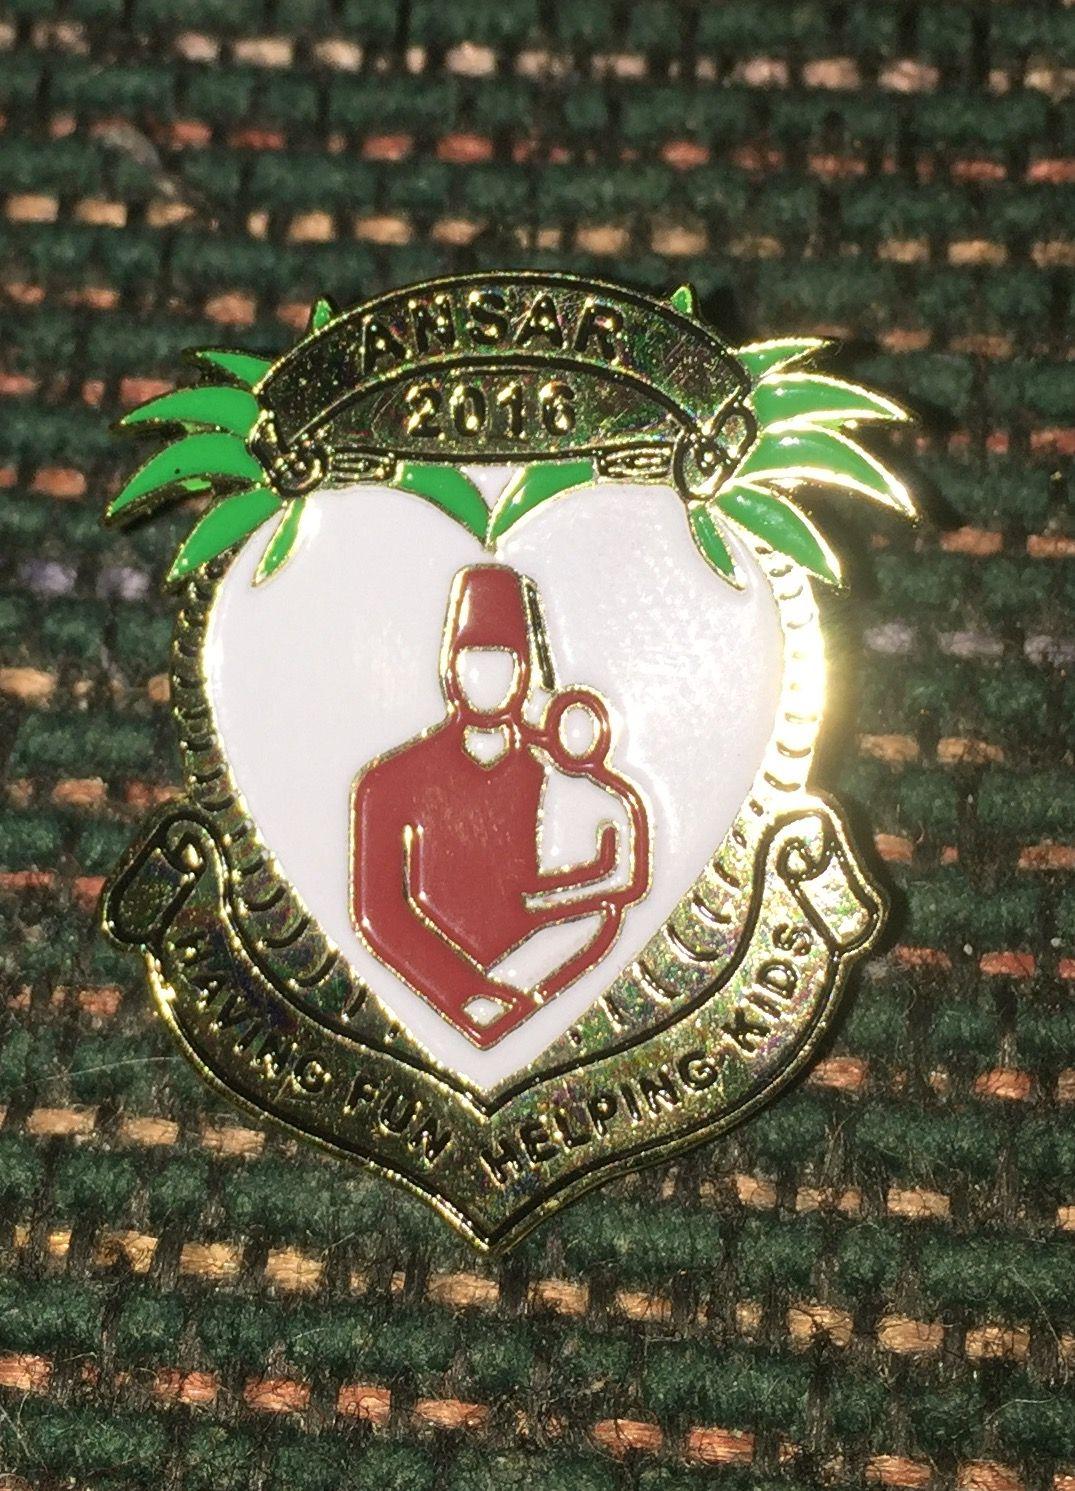 Pin by marvin gillis on ansar shriners pinterest find this pin and more on ansar shriners by ansarshriners buycottarizona